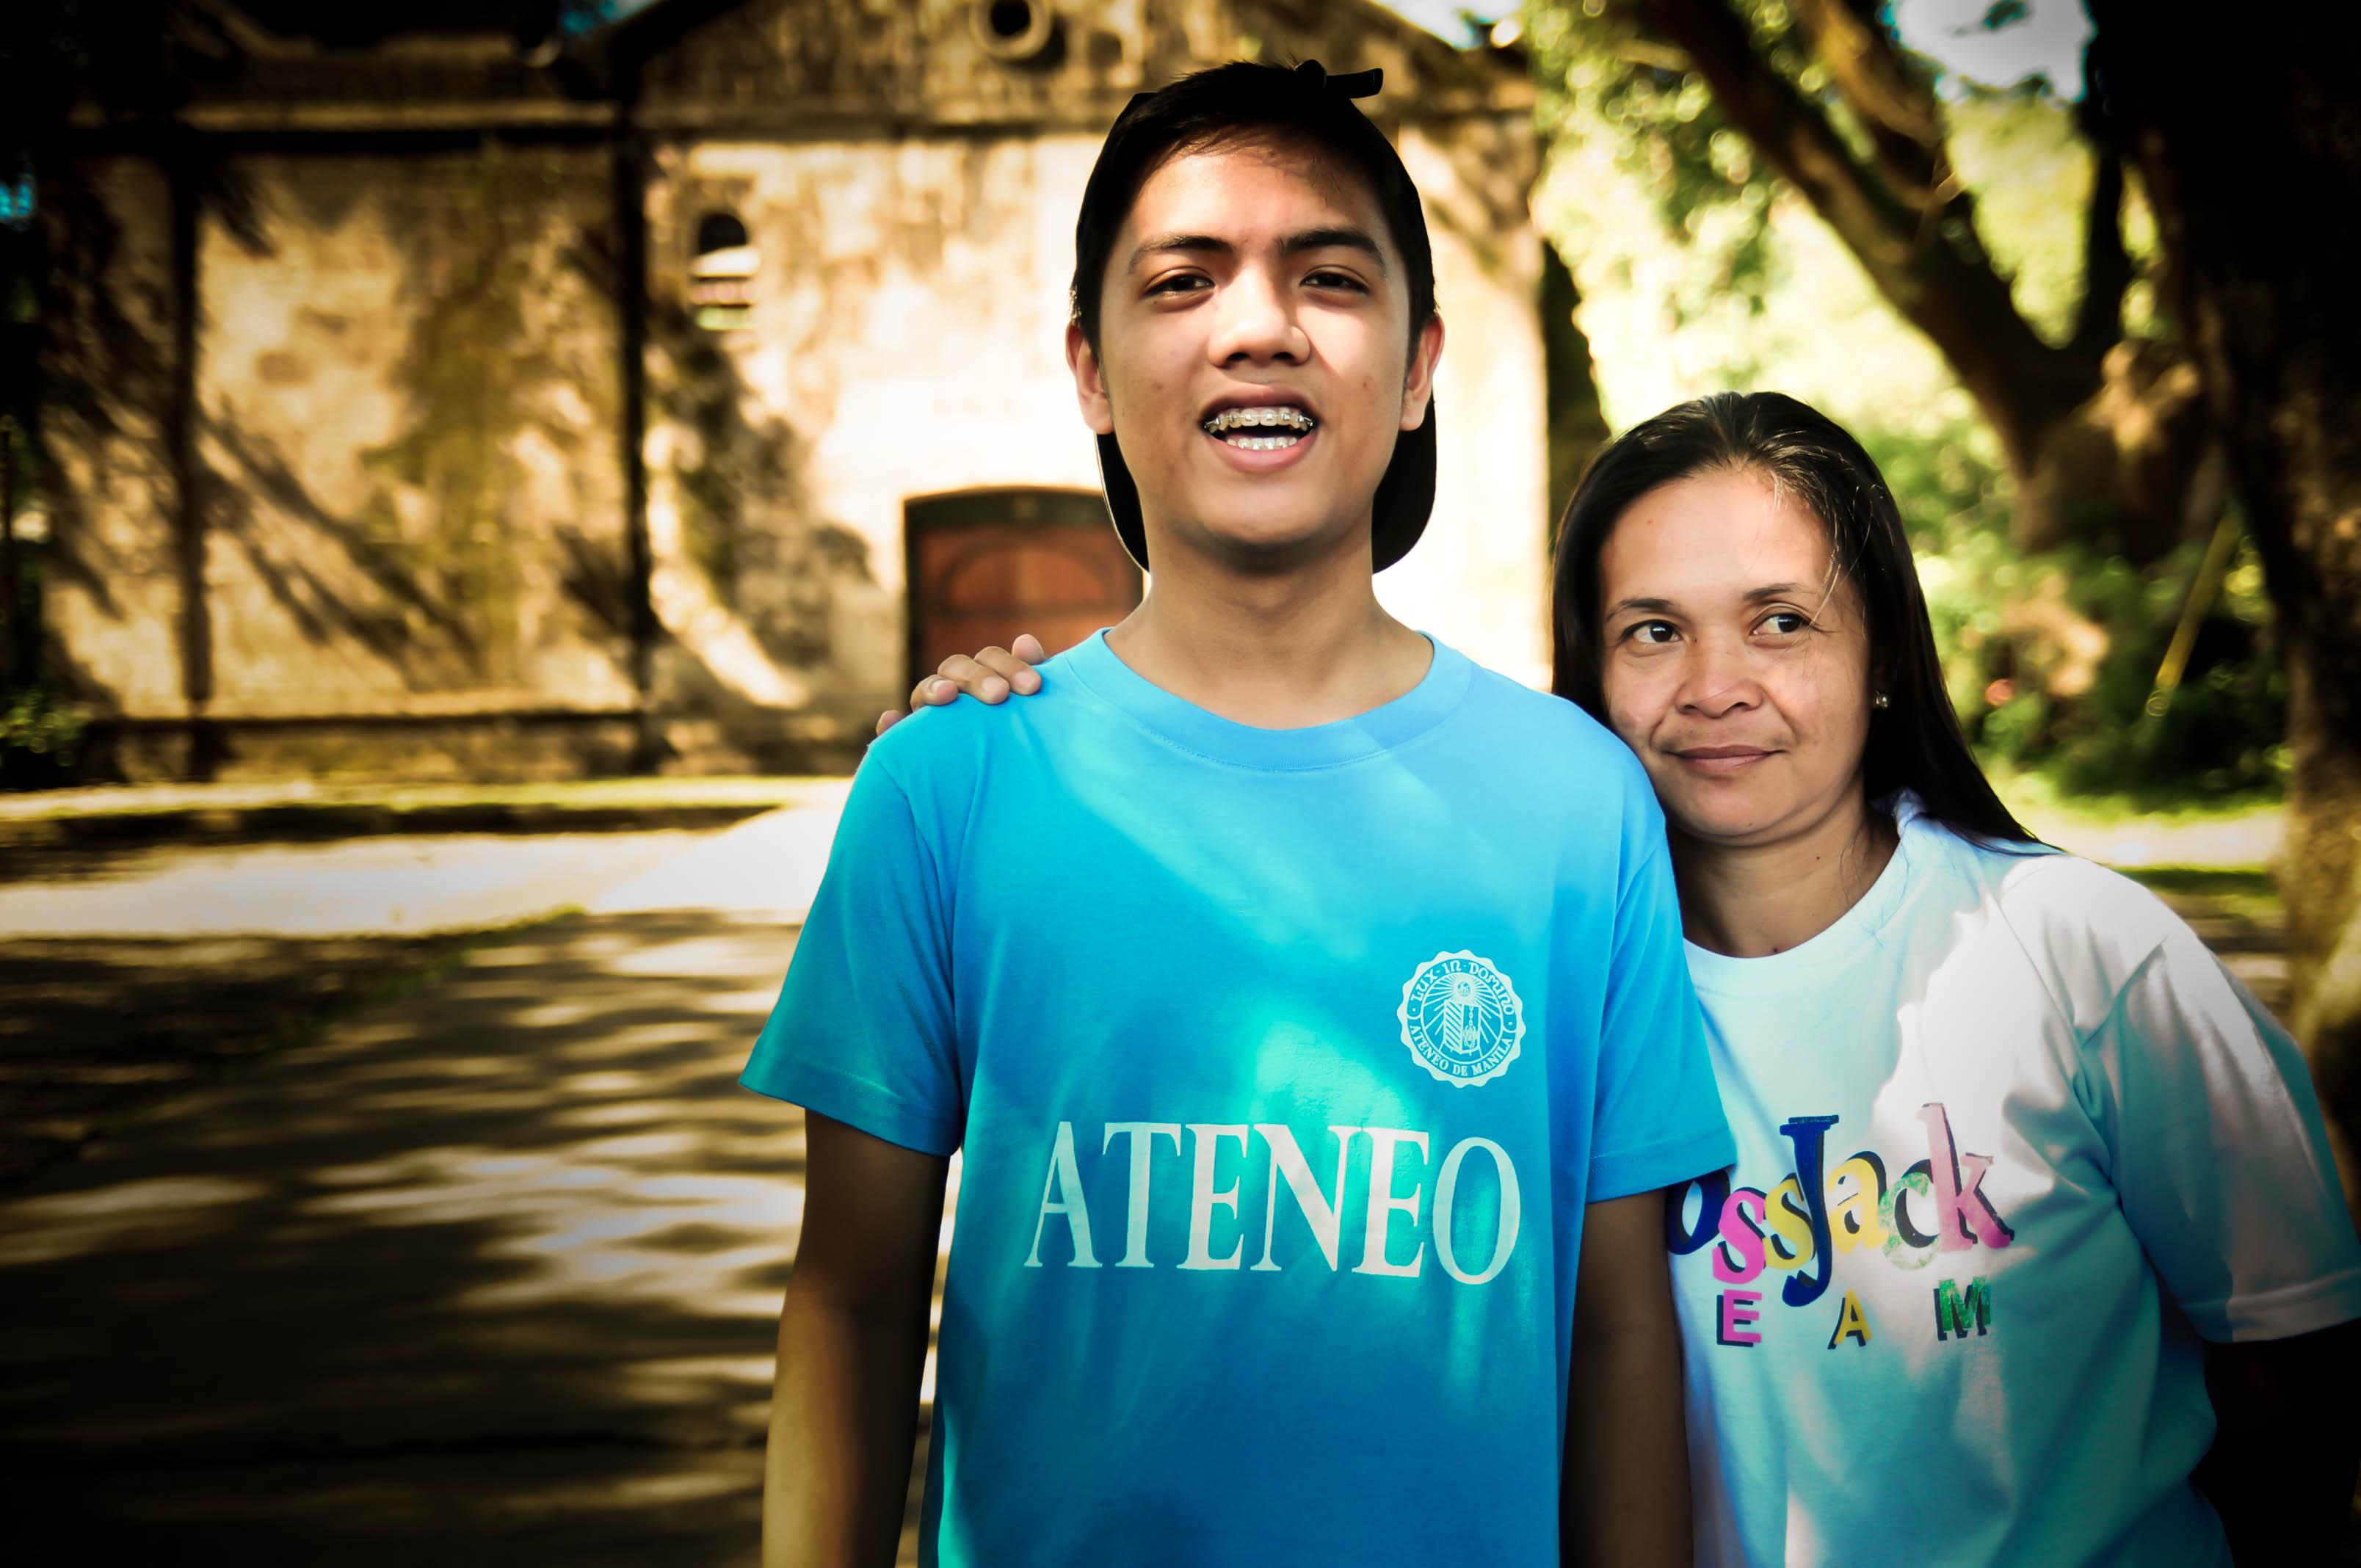 Photo by Bok Pioquid. Ateneo HS' Christian Service Involvement Program